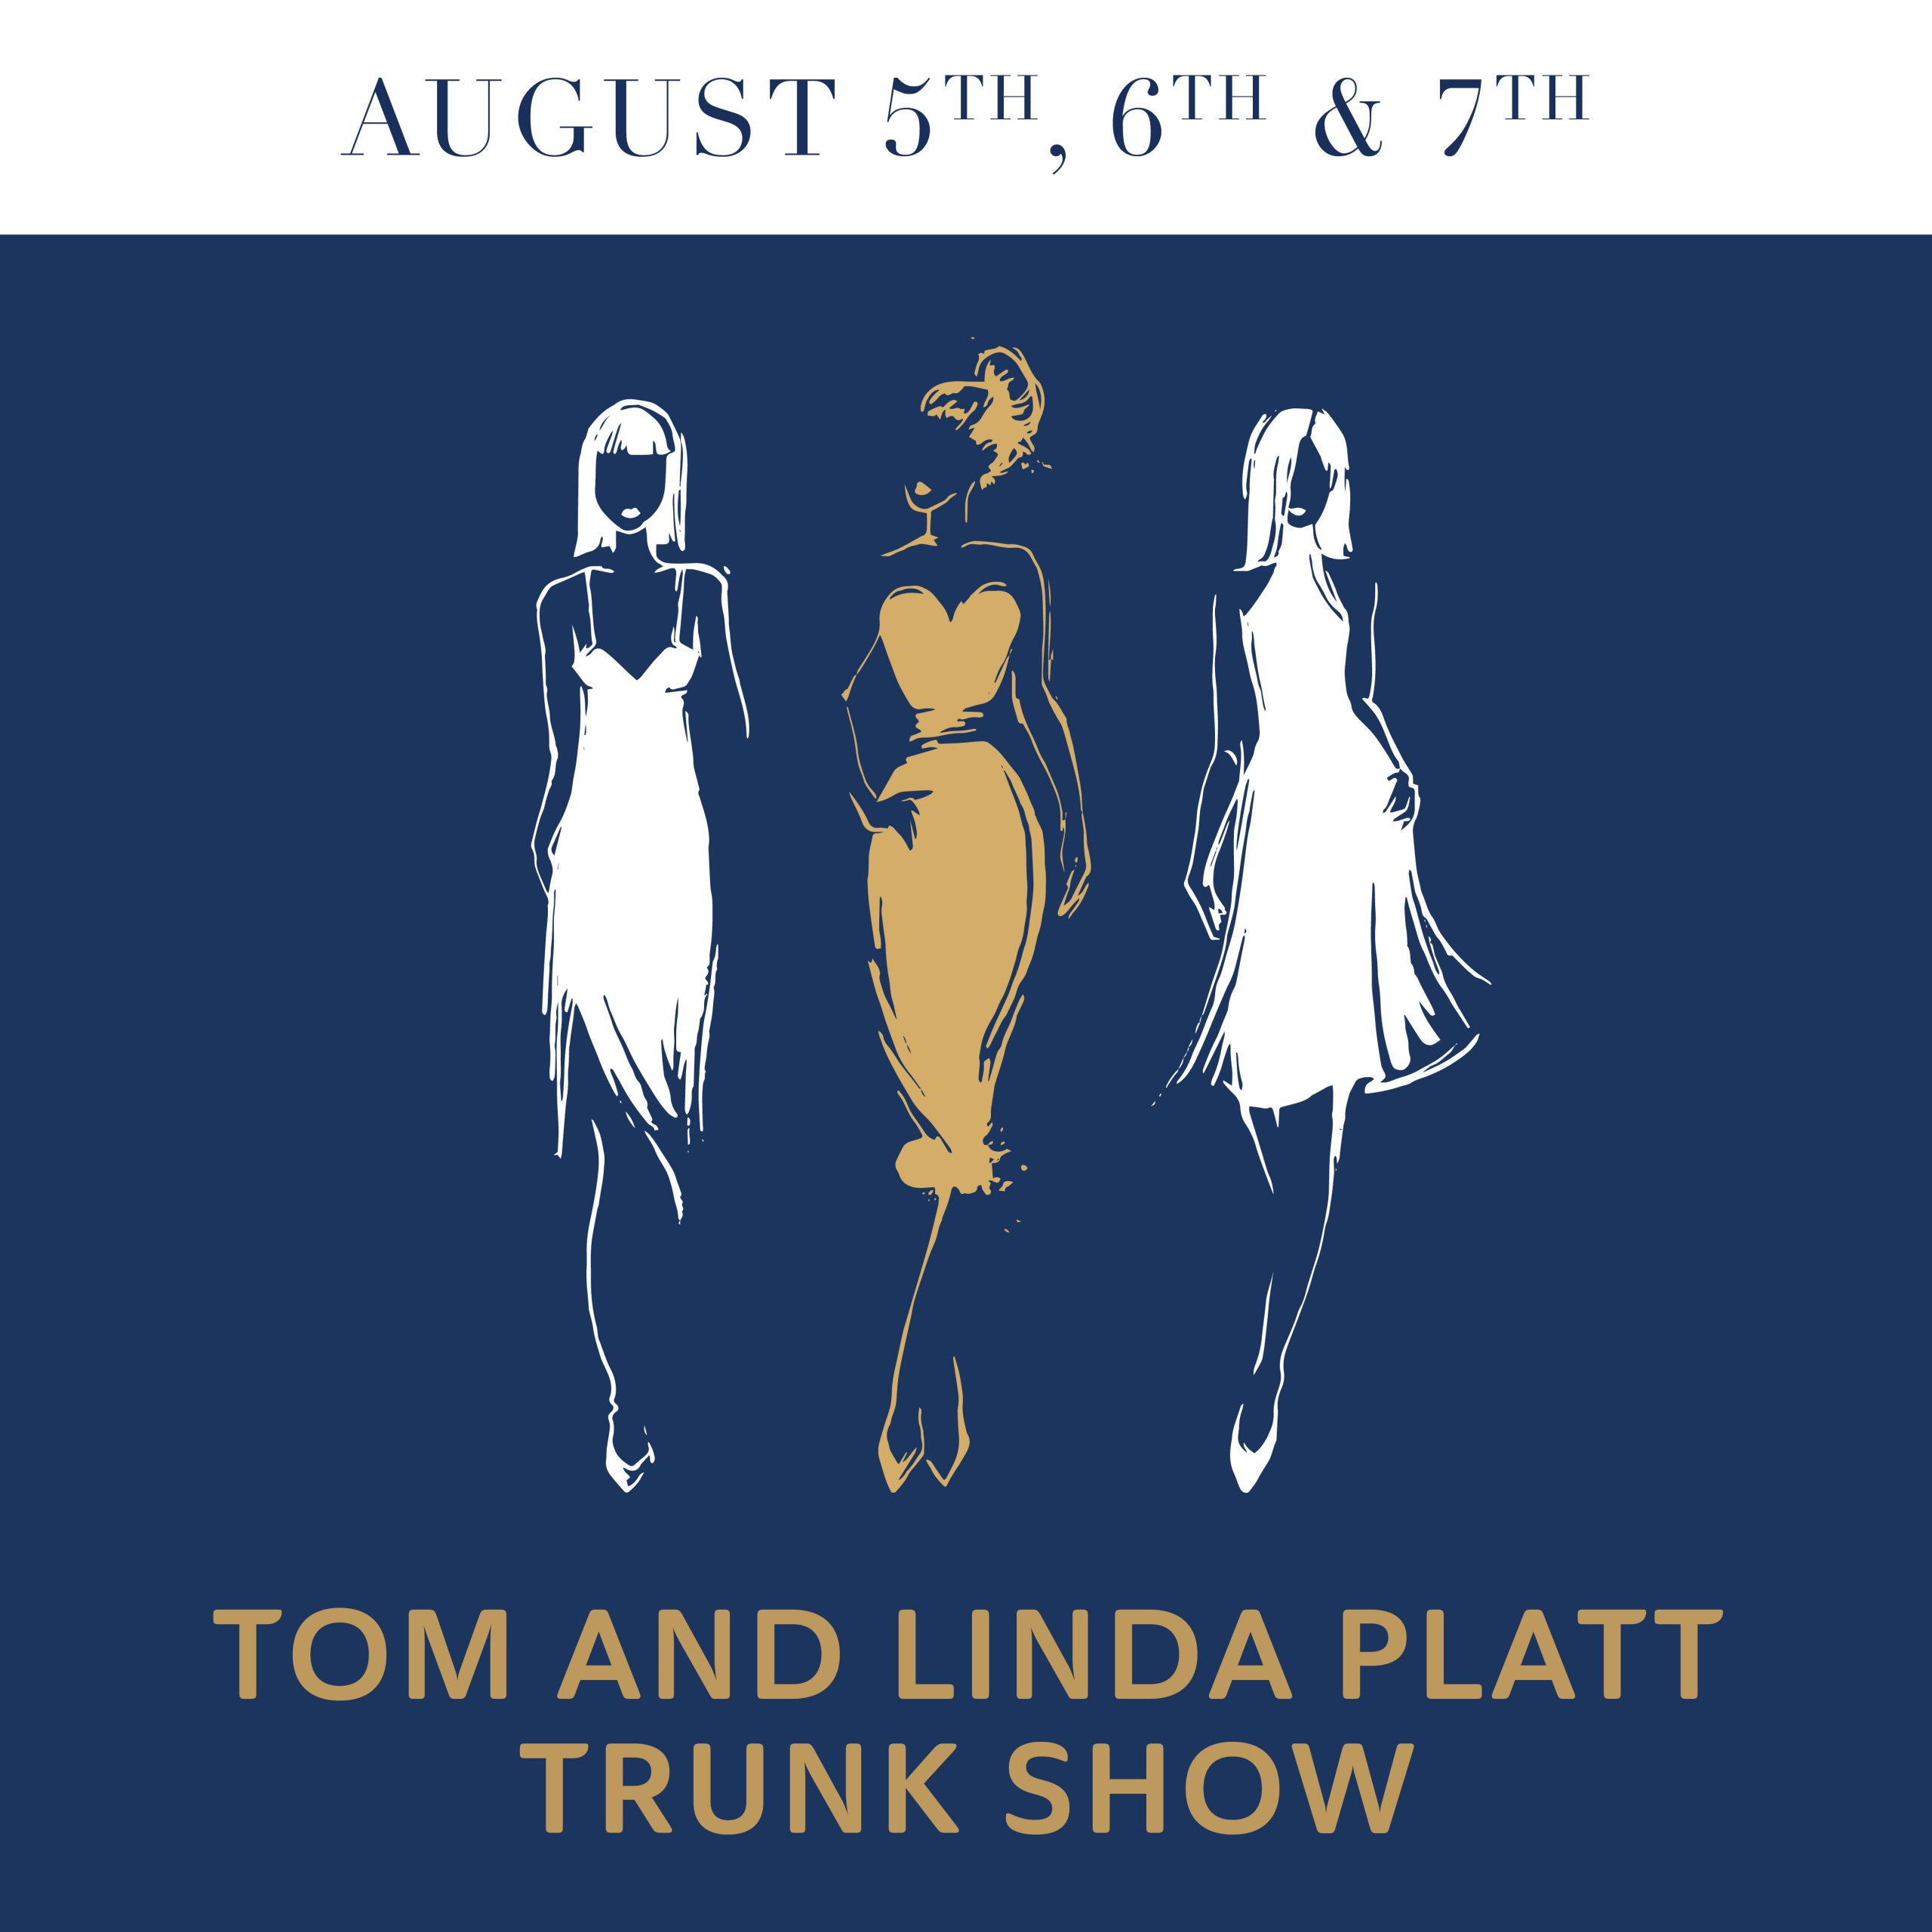 Tom and Linda Platt Trunk Show